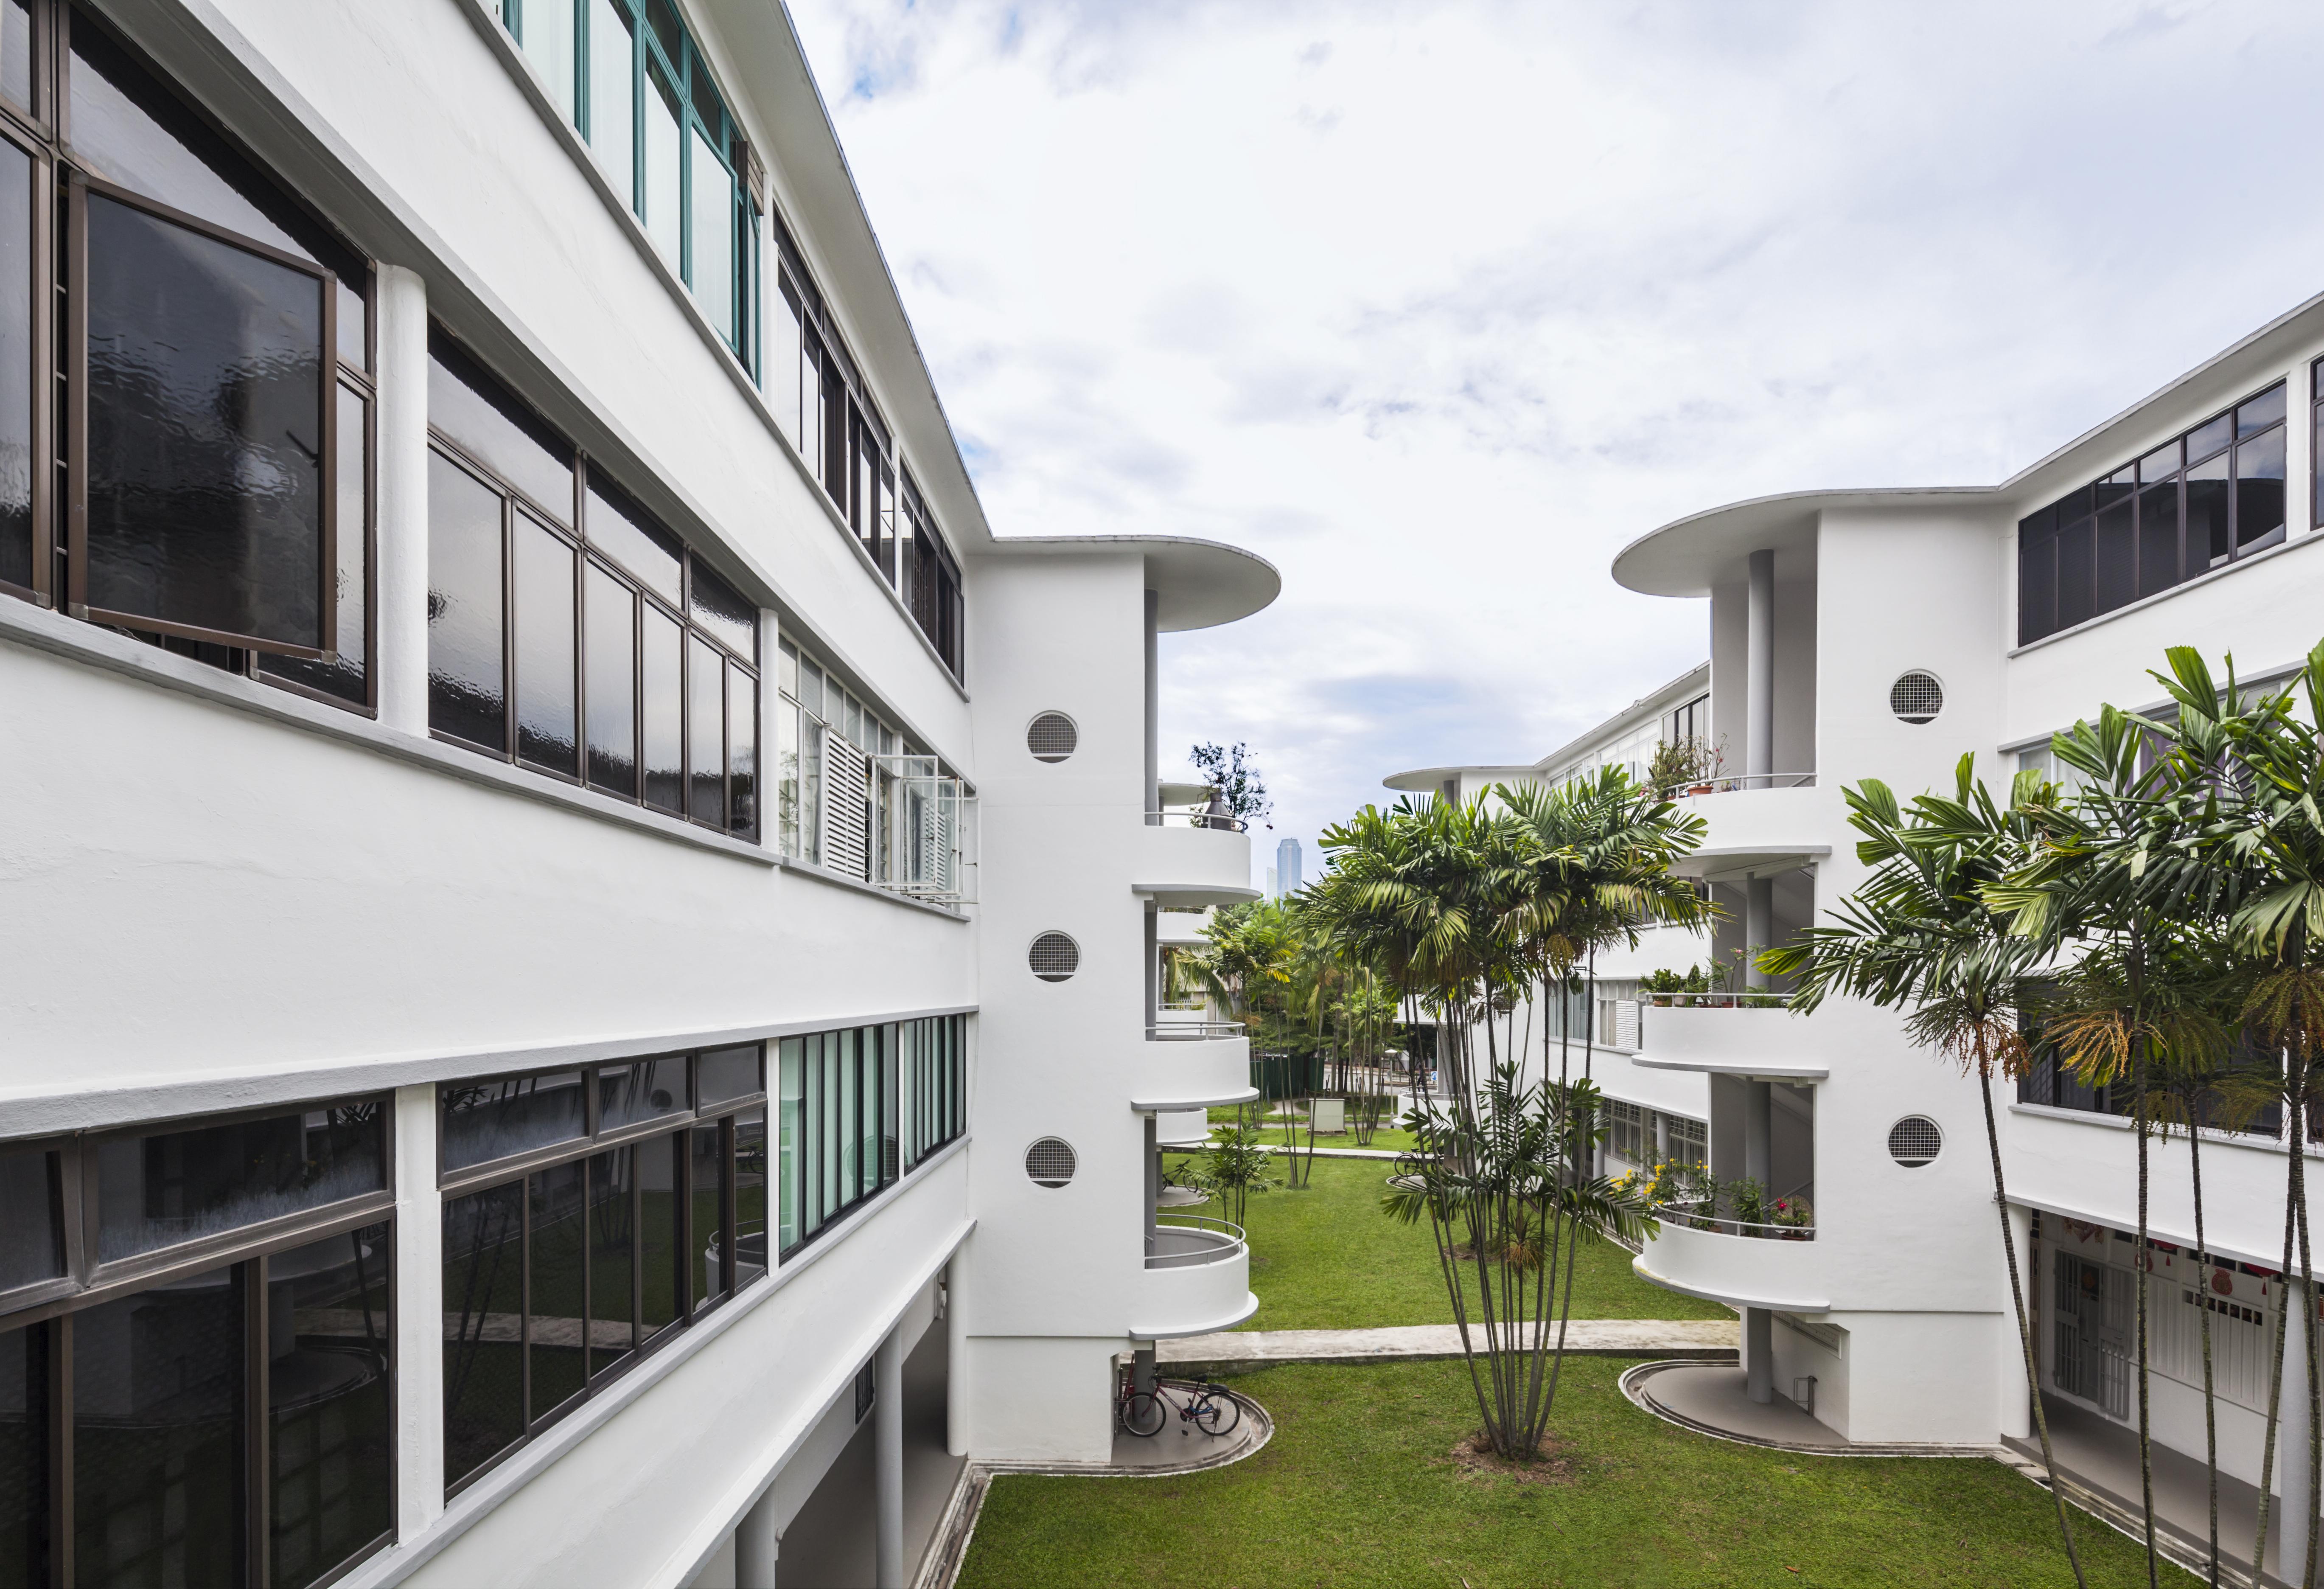 Tiong Bahru - HDB estates.